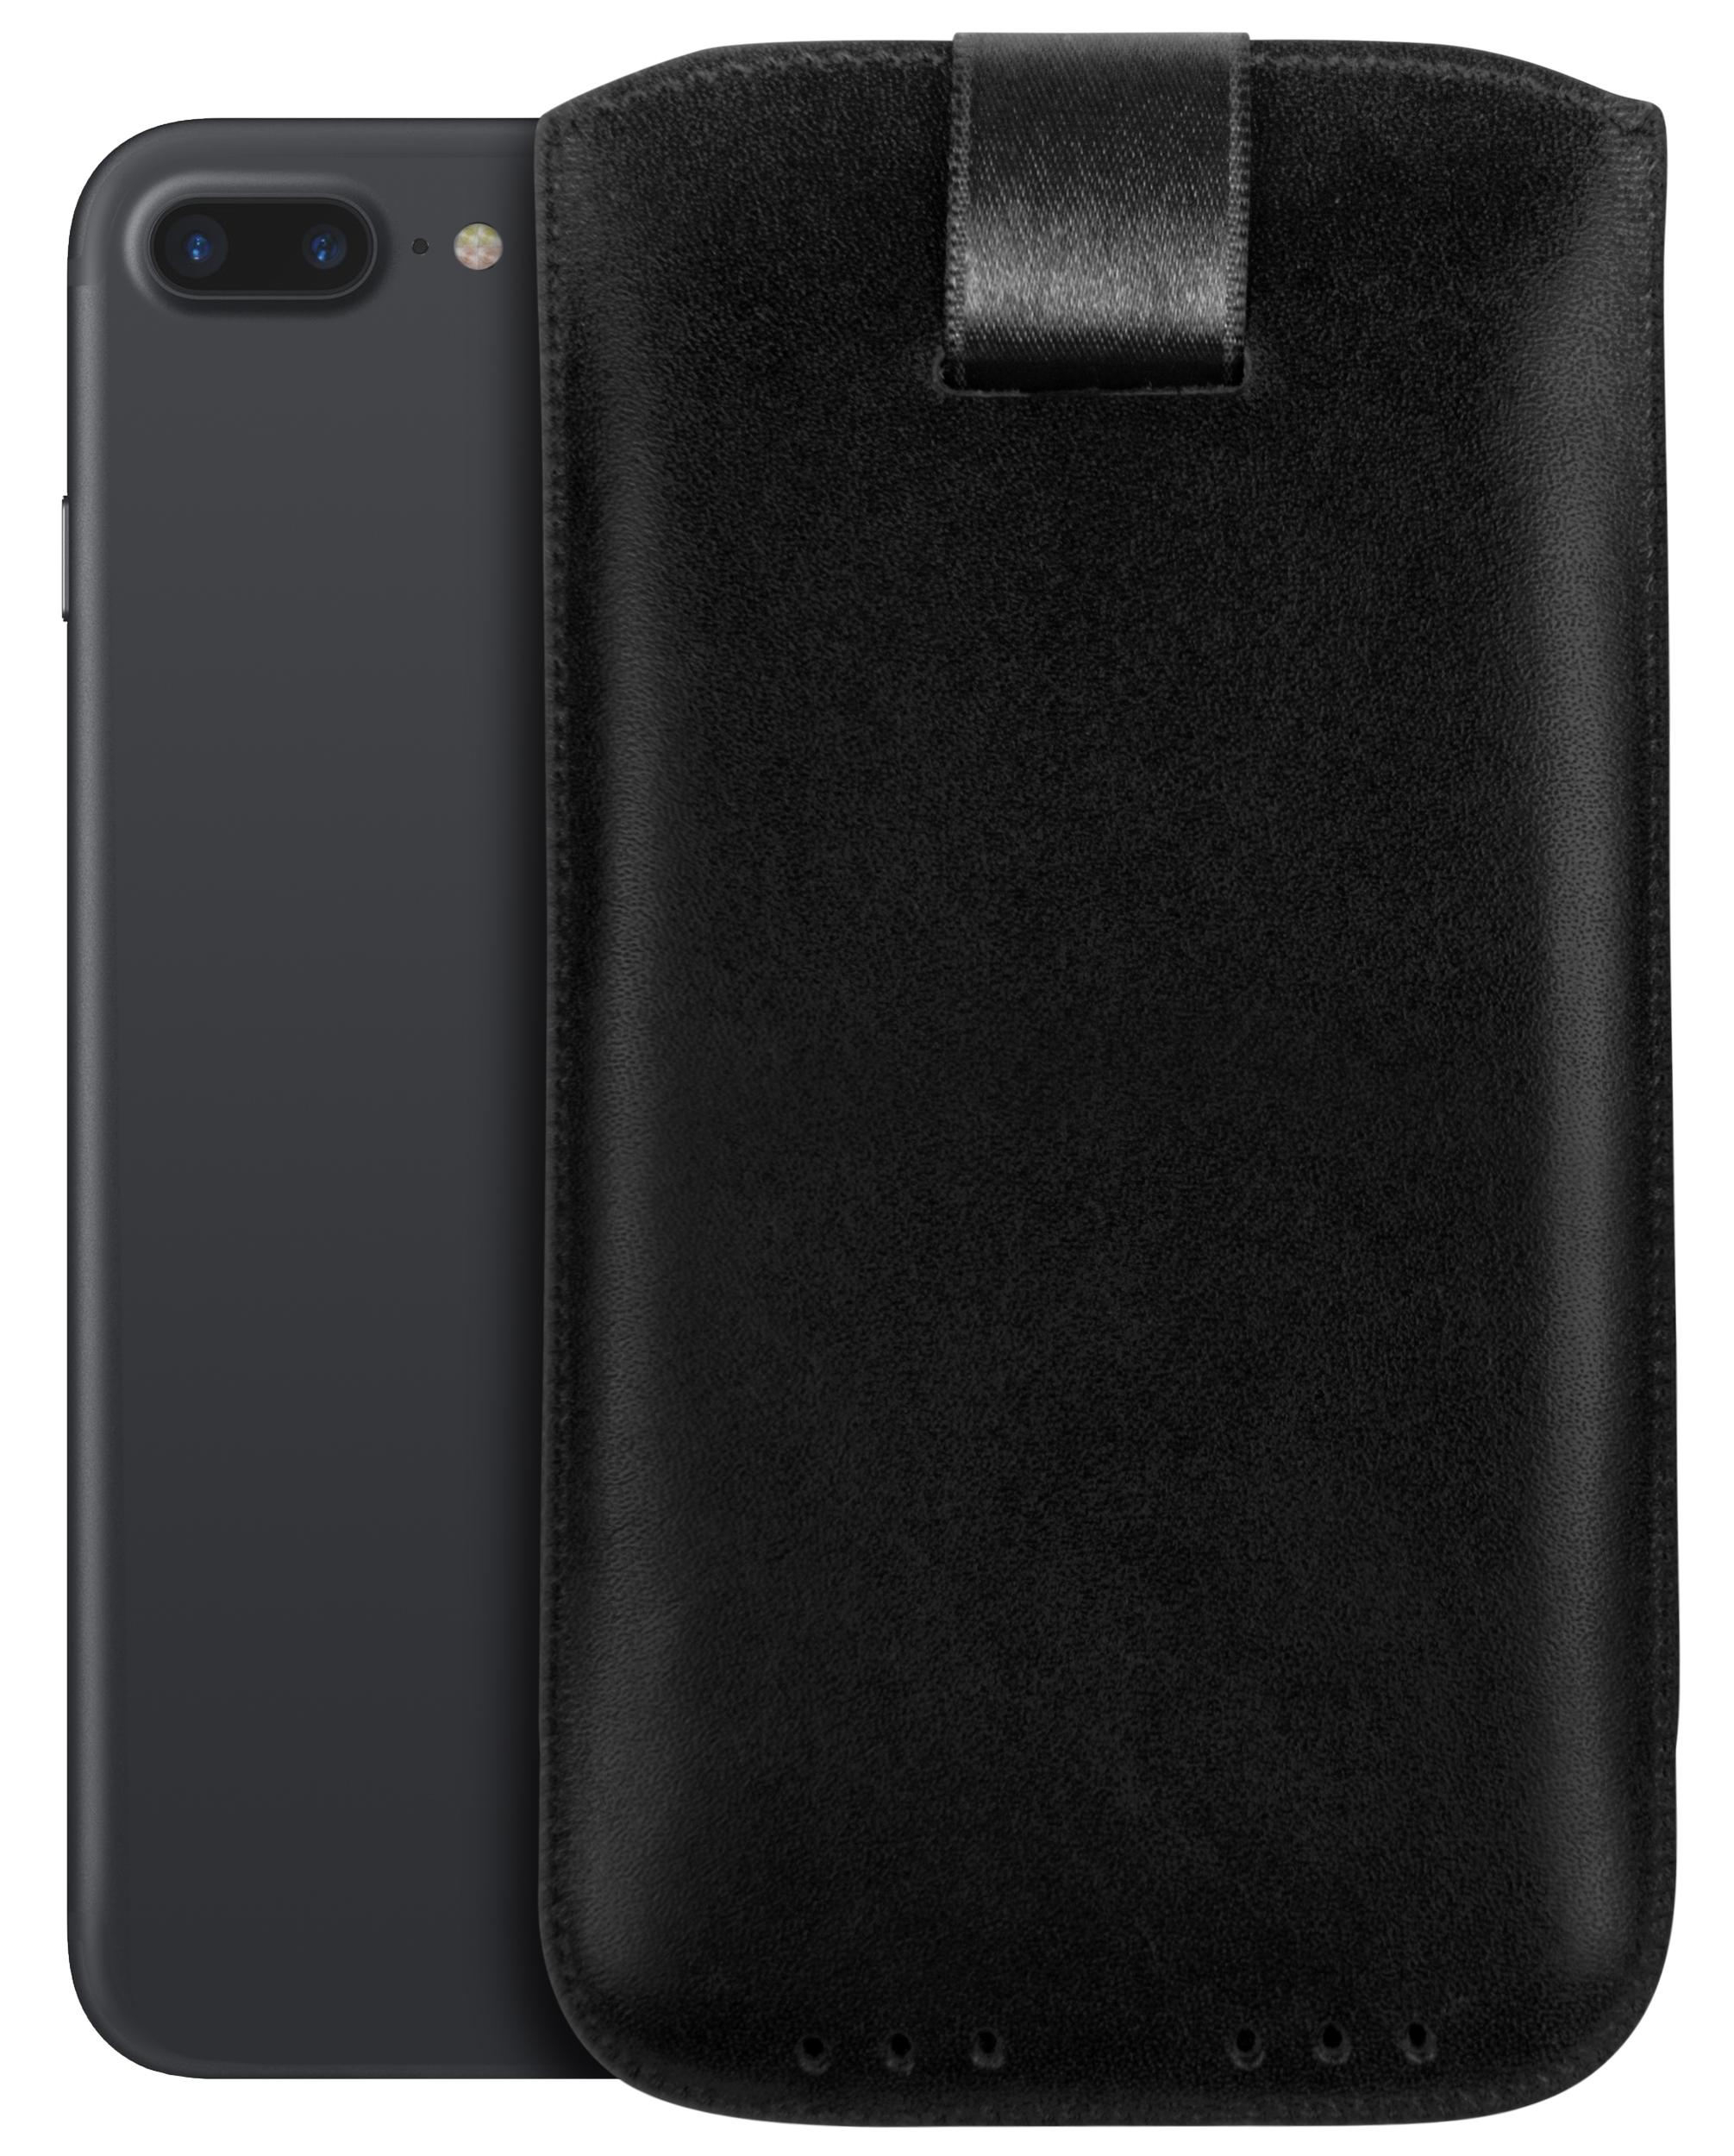 mumbi ledertasche f r apple iphone 8 7 plus h lle leder. Black Bedroom Furniture Sets. Home Design Ideas